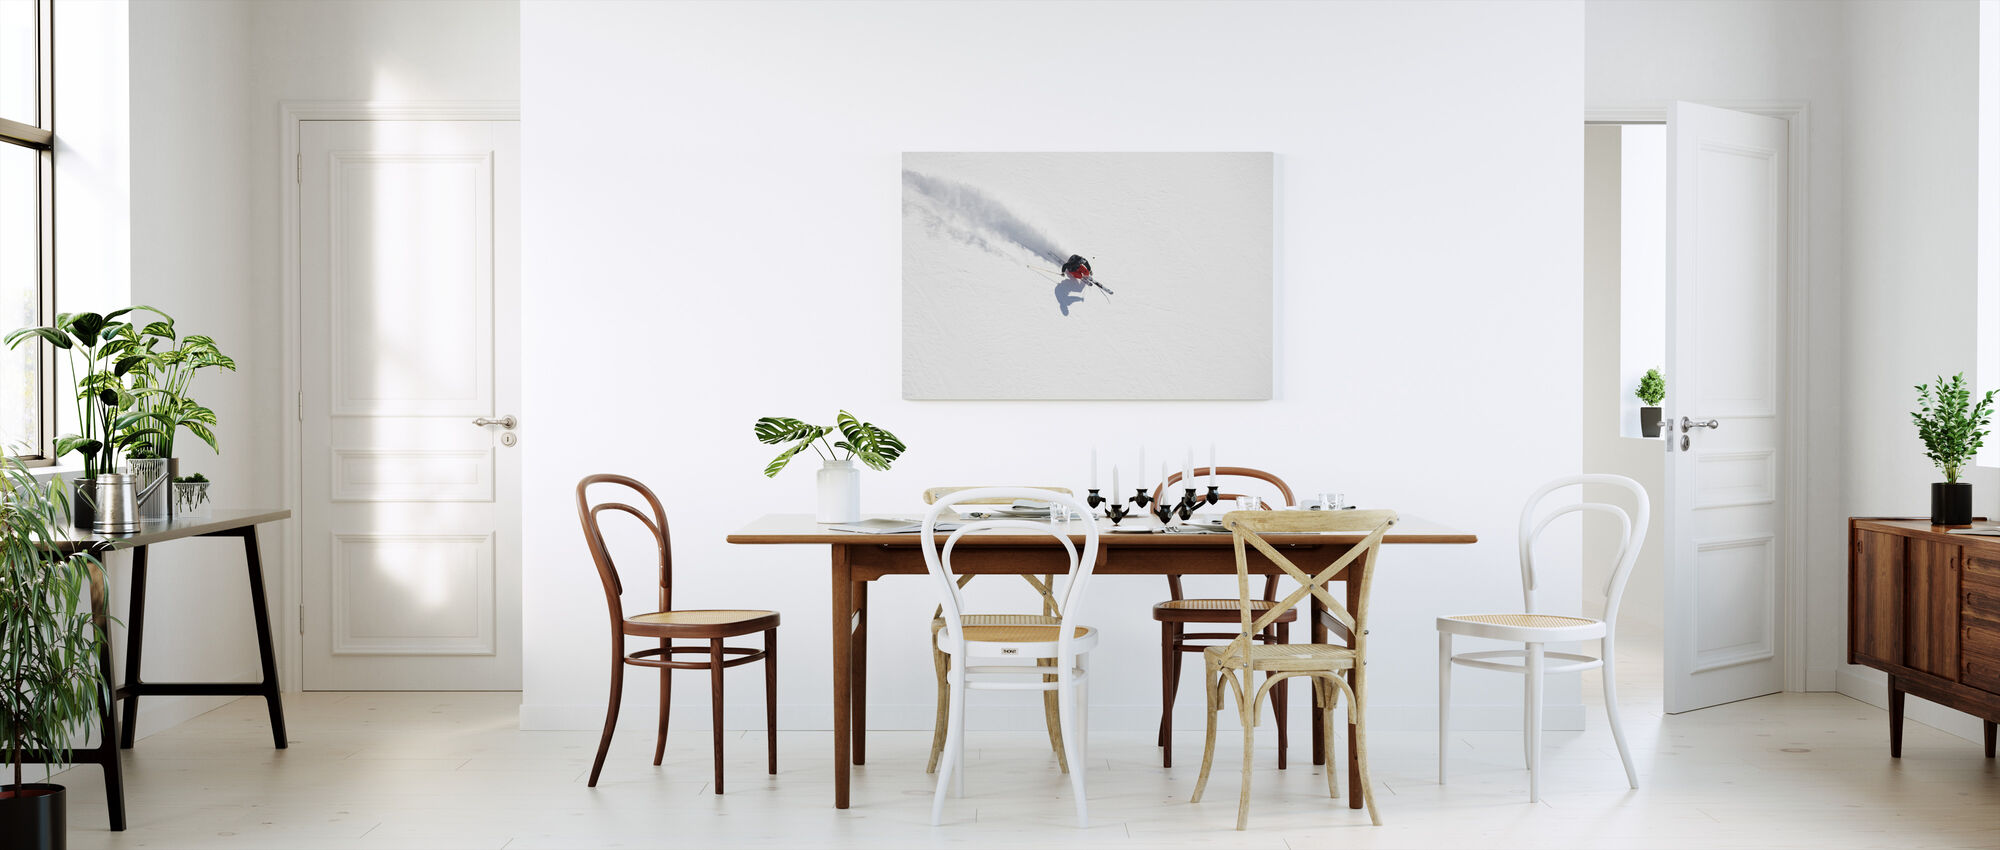 Skiing in Chamonix, France, Europe - Canvas print - Kitchen